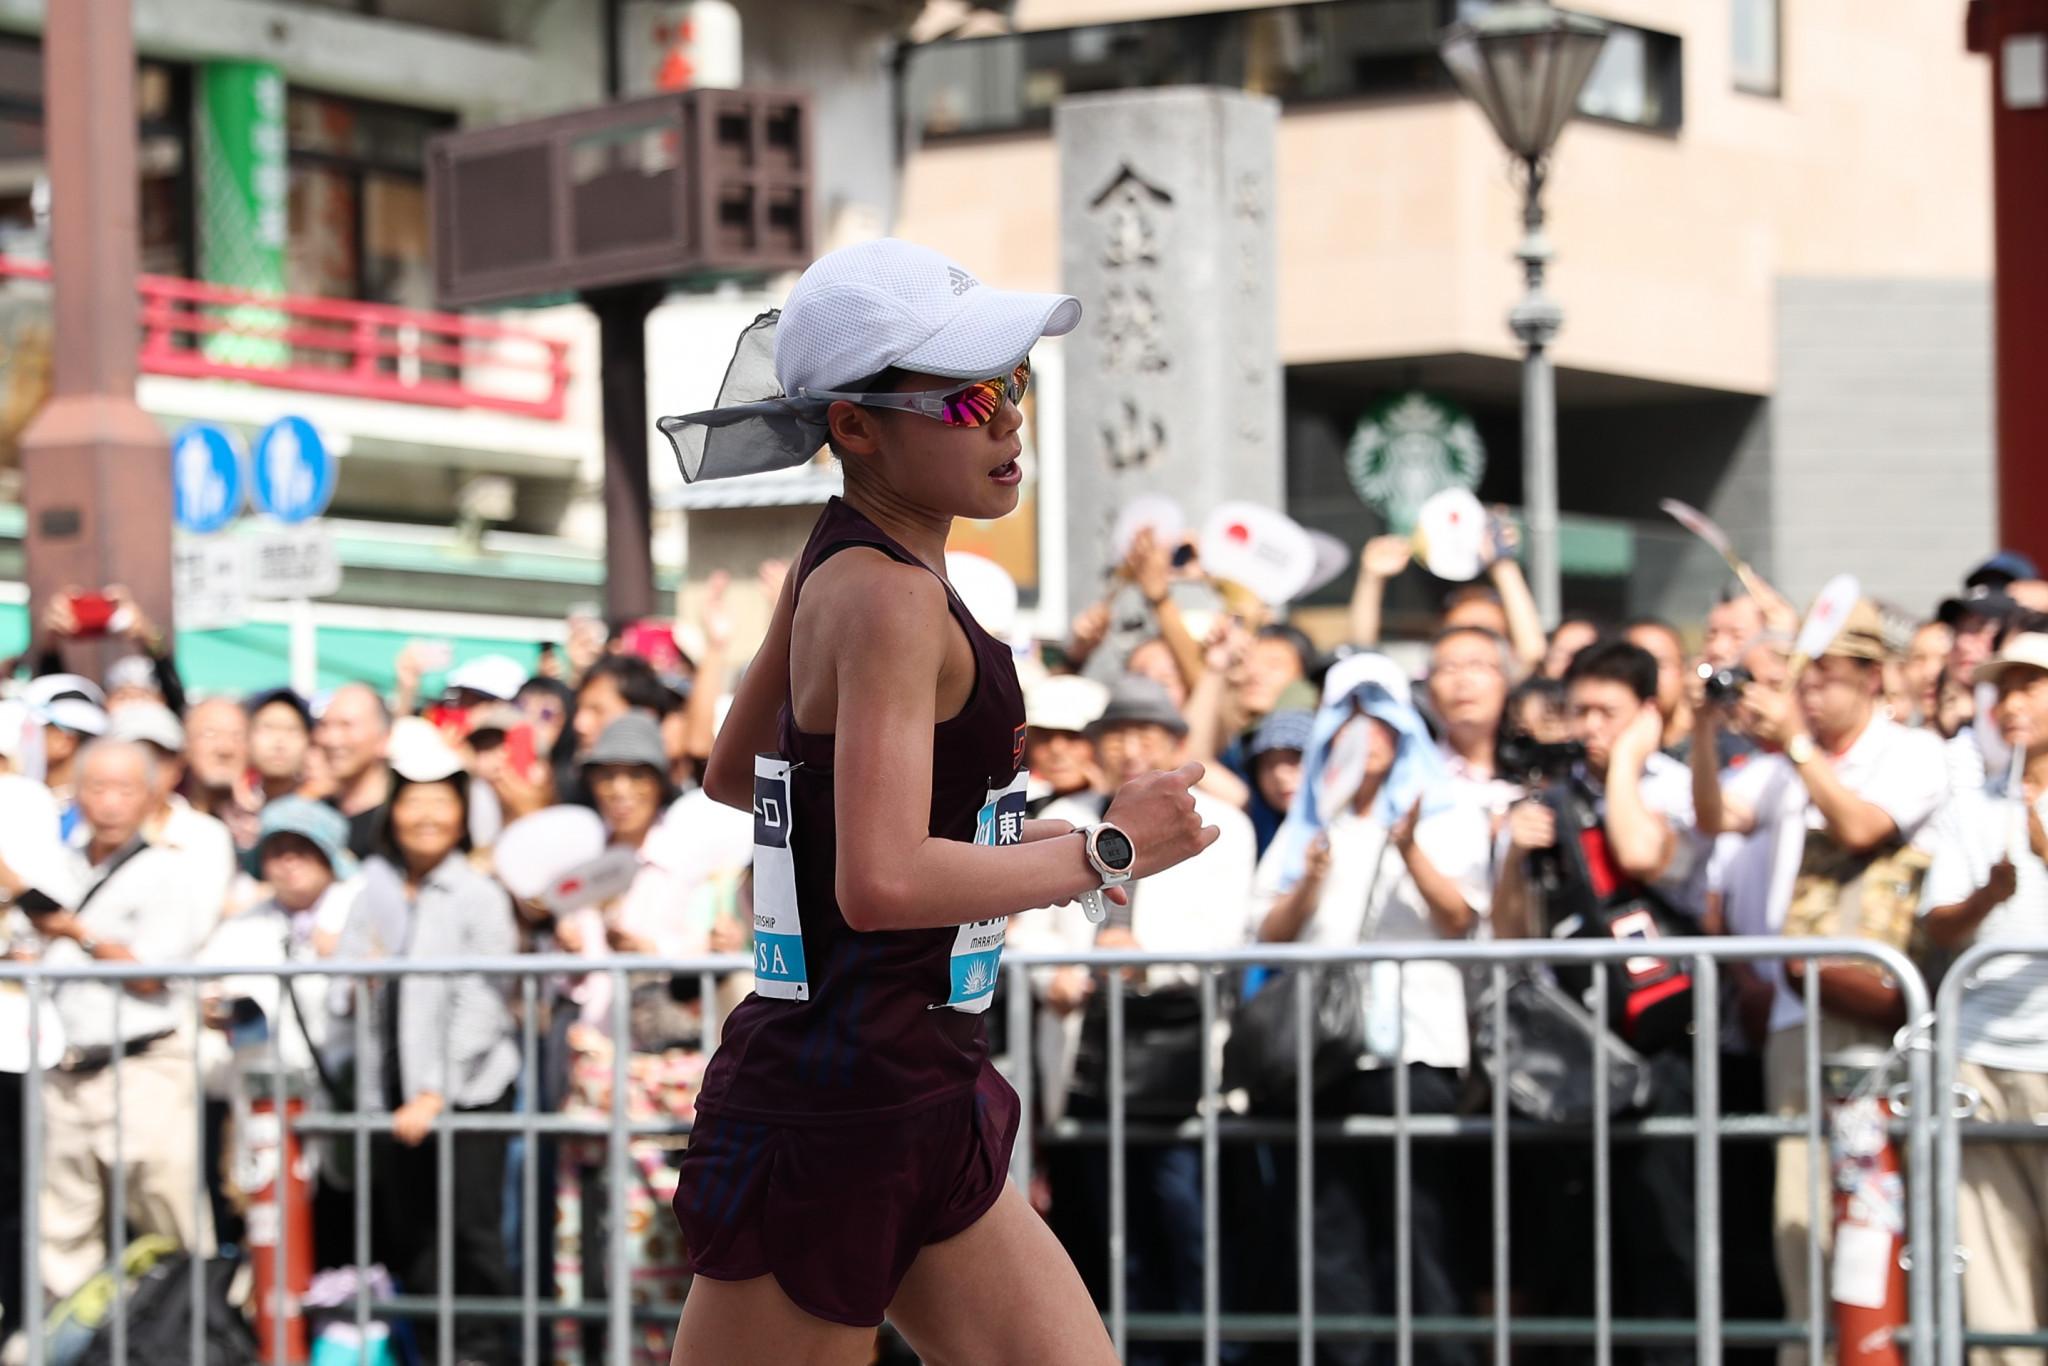 Ichiyama and Osako complete Japanese marathon squads for Tokyo 2020